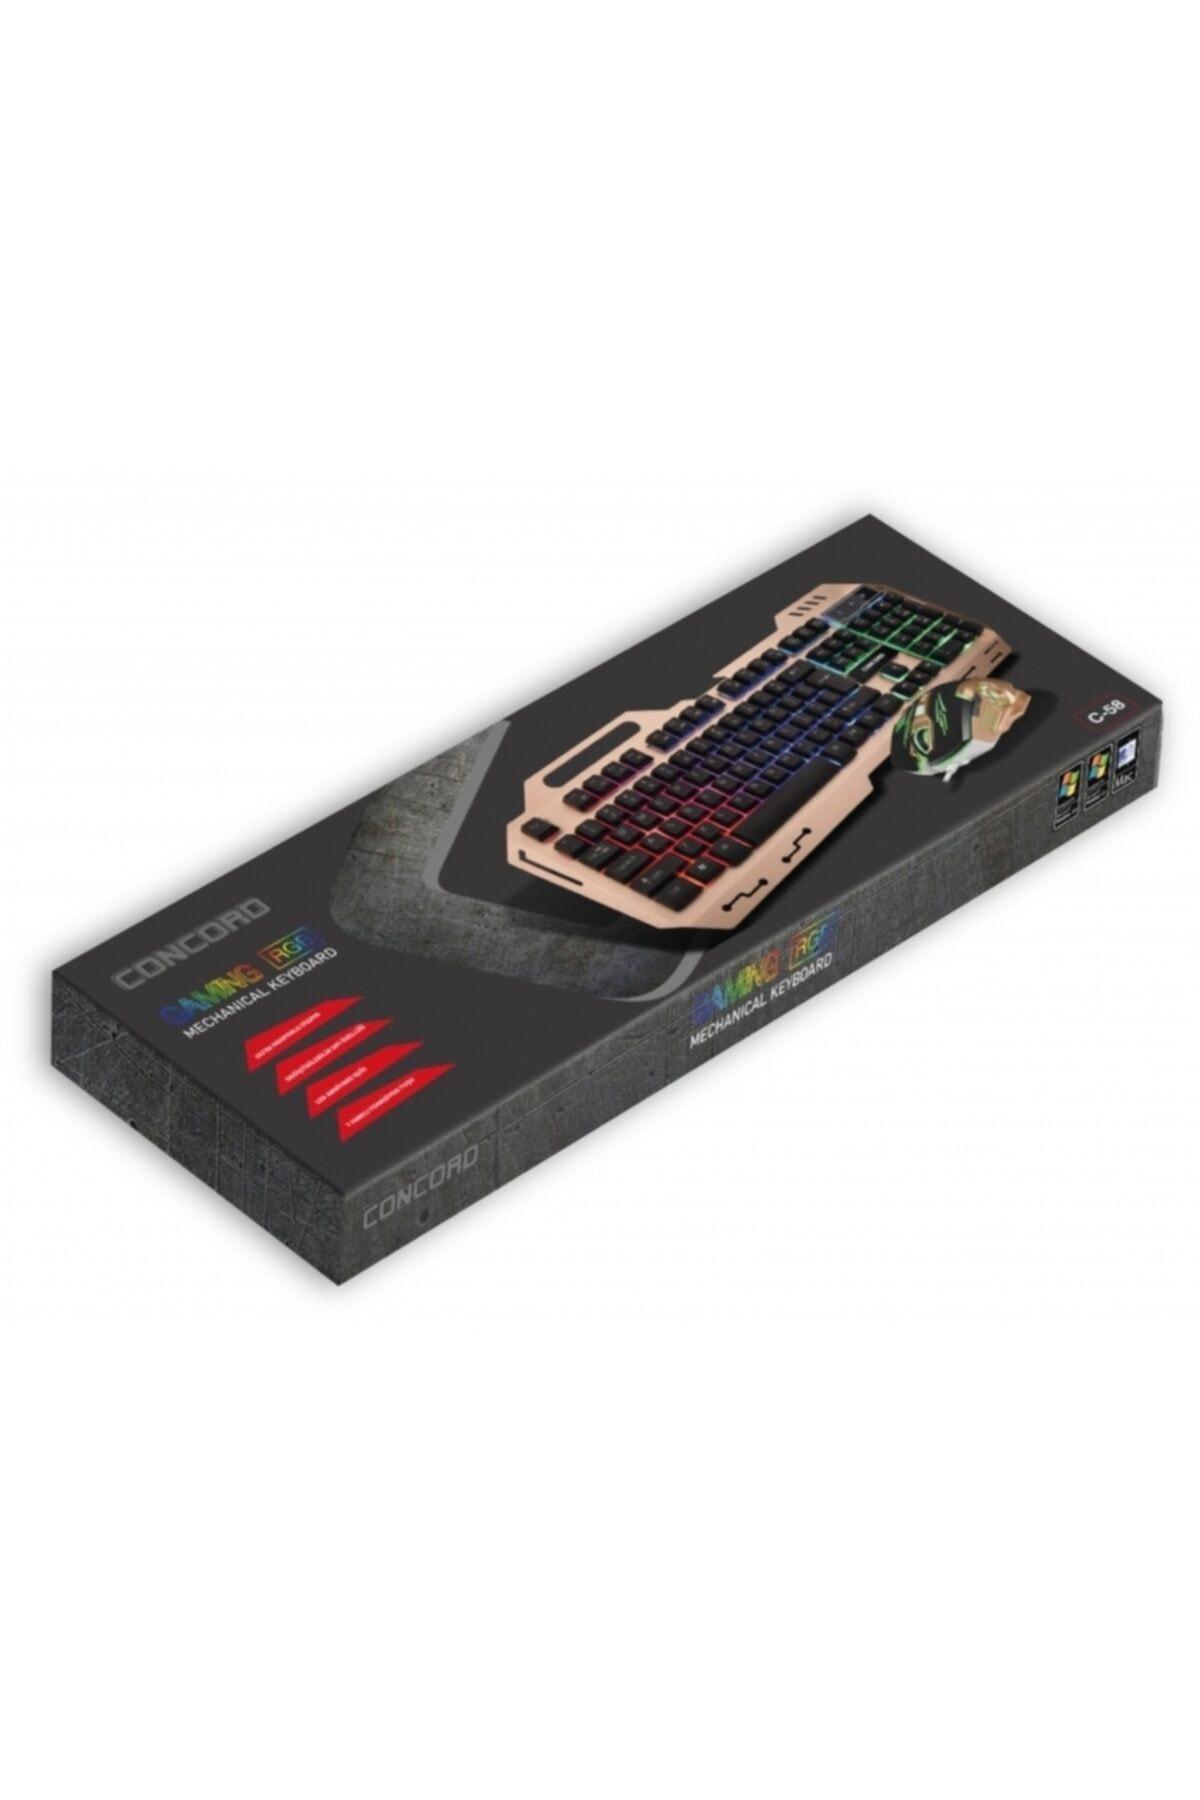 Concord C58 Kablolu Gaming Klavye Mouse Set 2